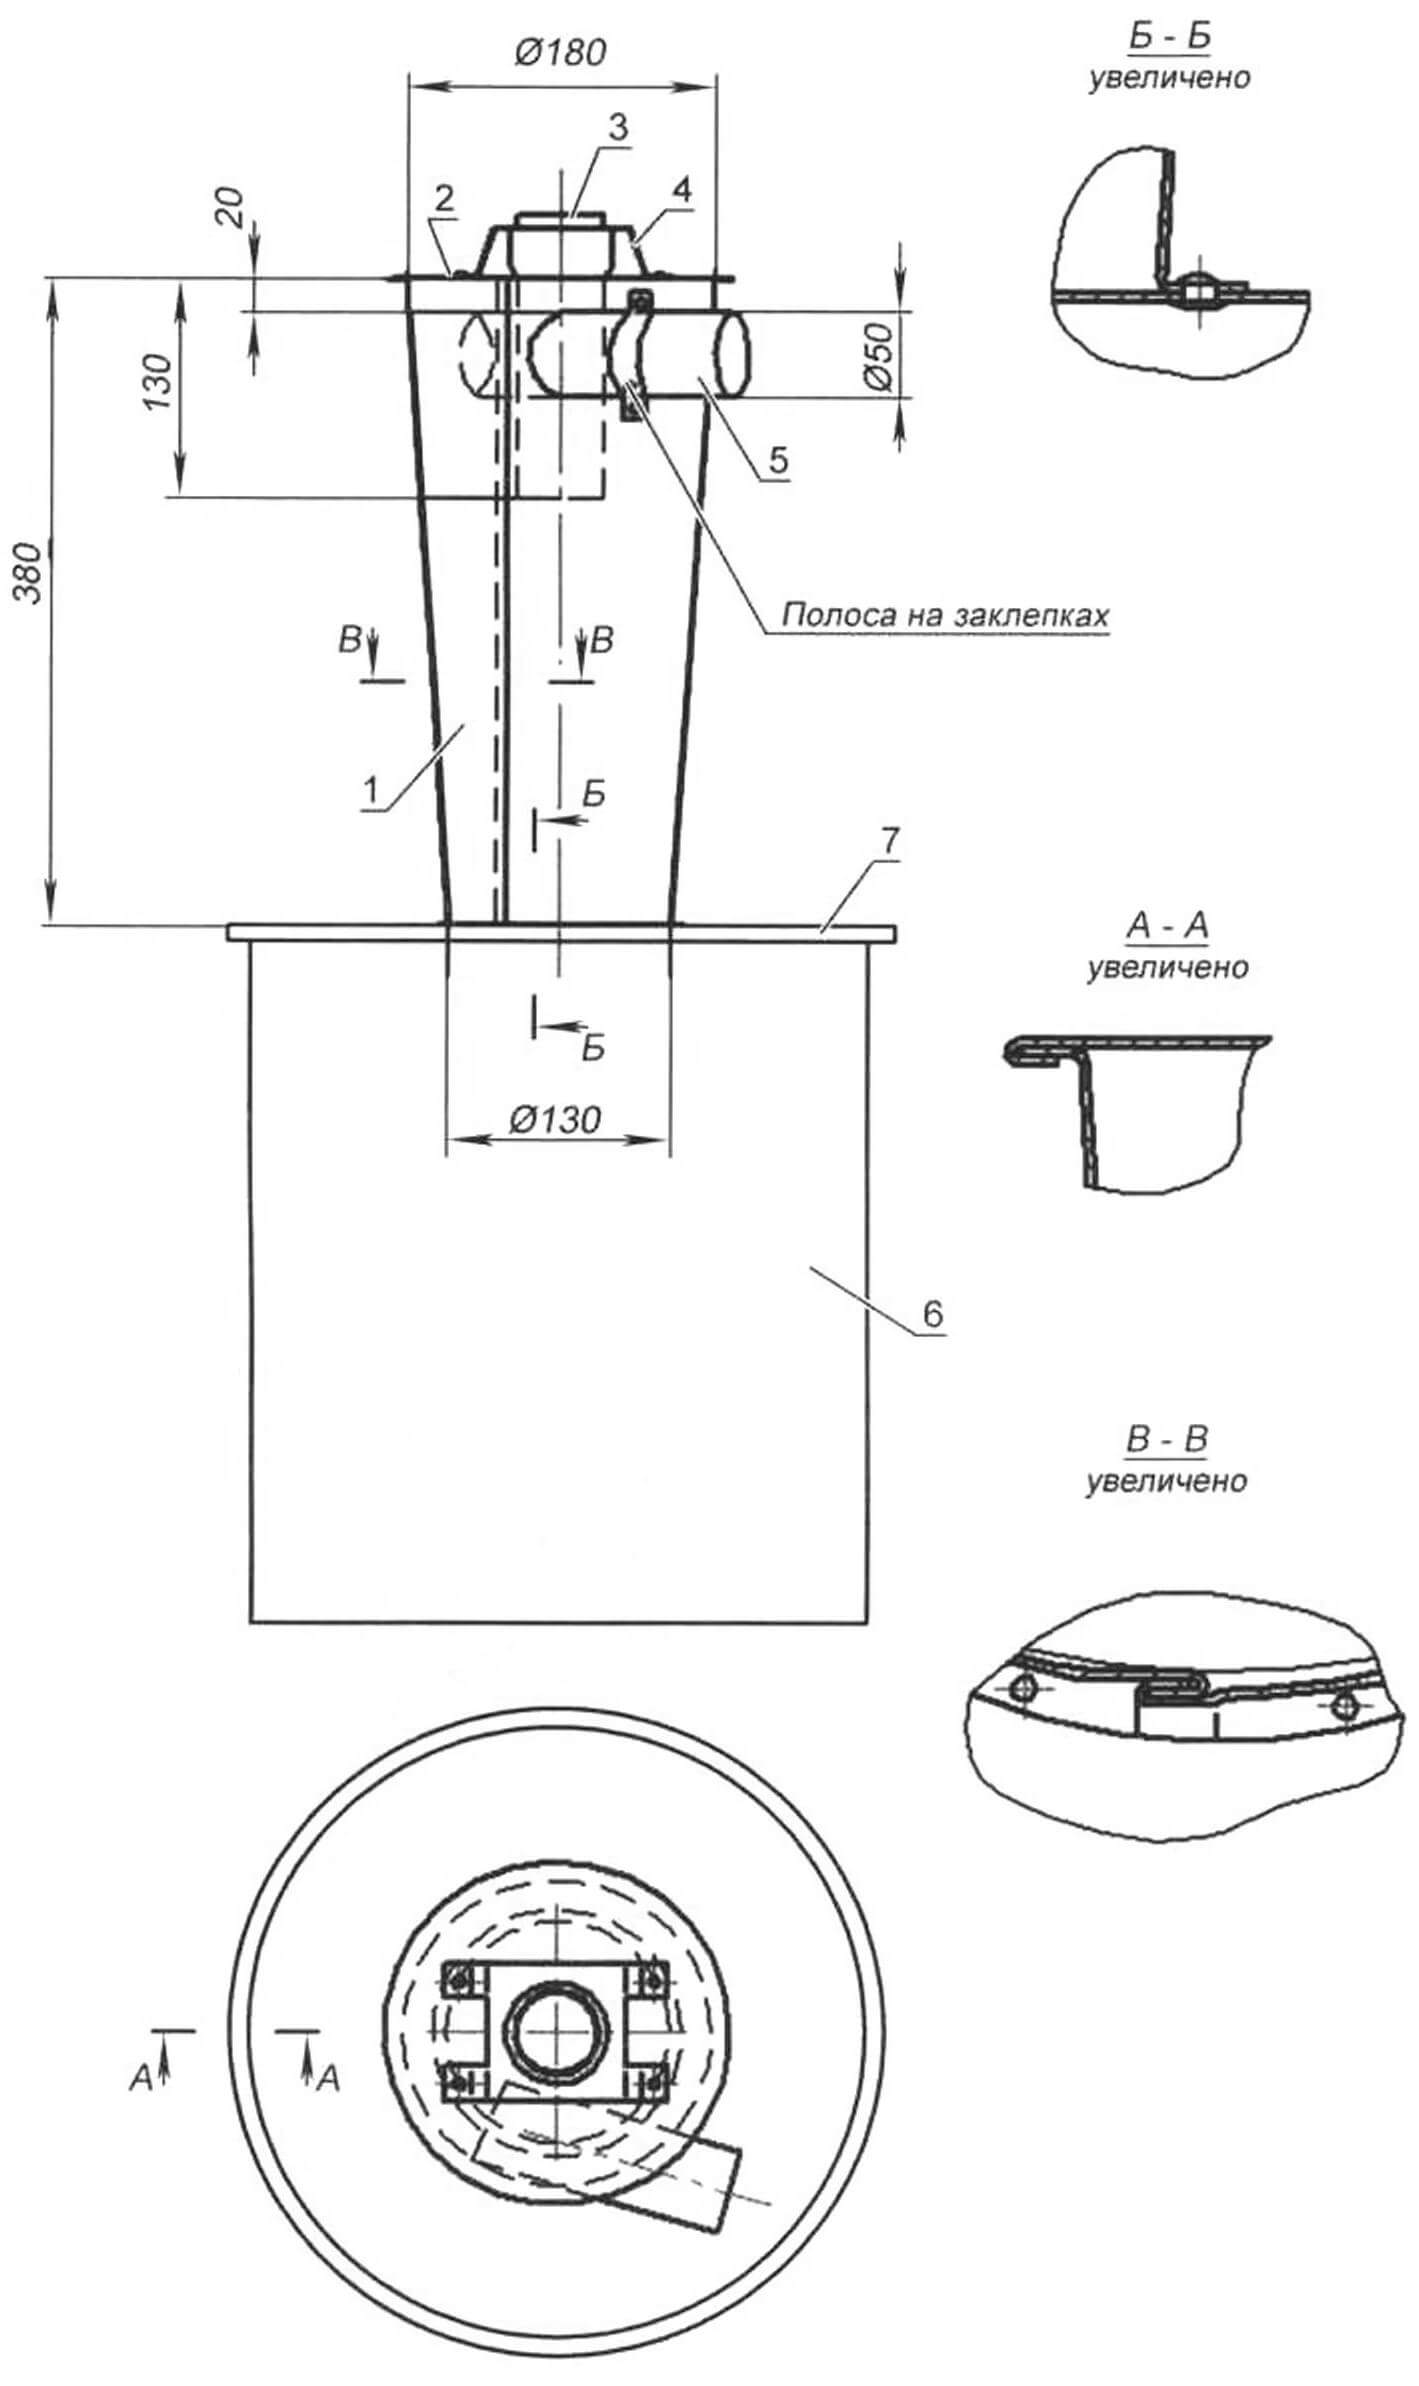 Циклон с ведром для опилок (разрез)